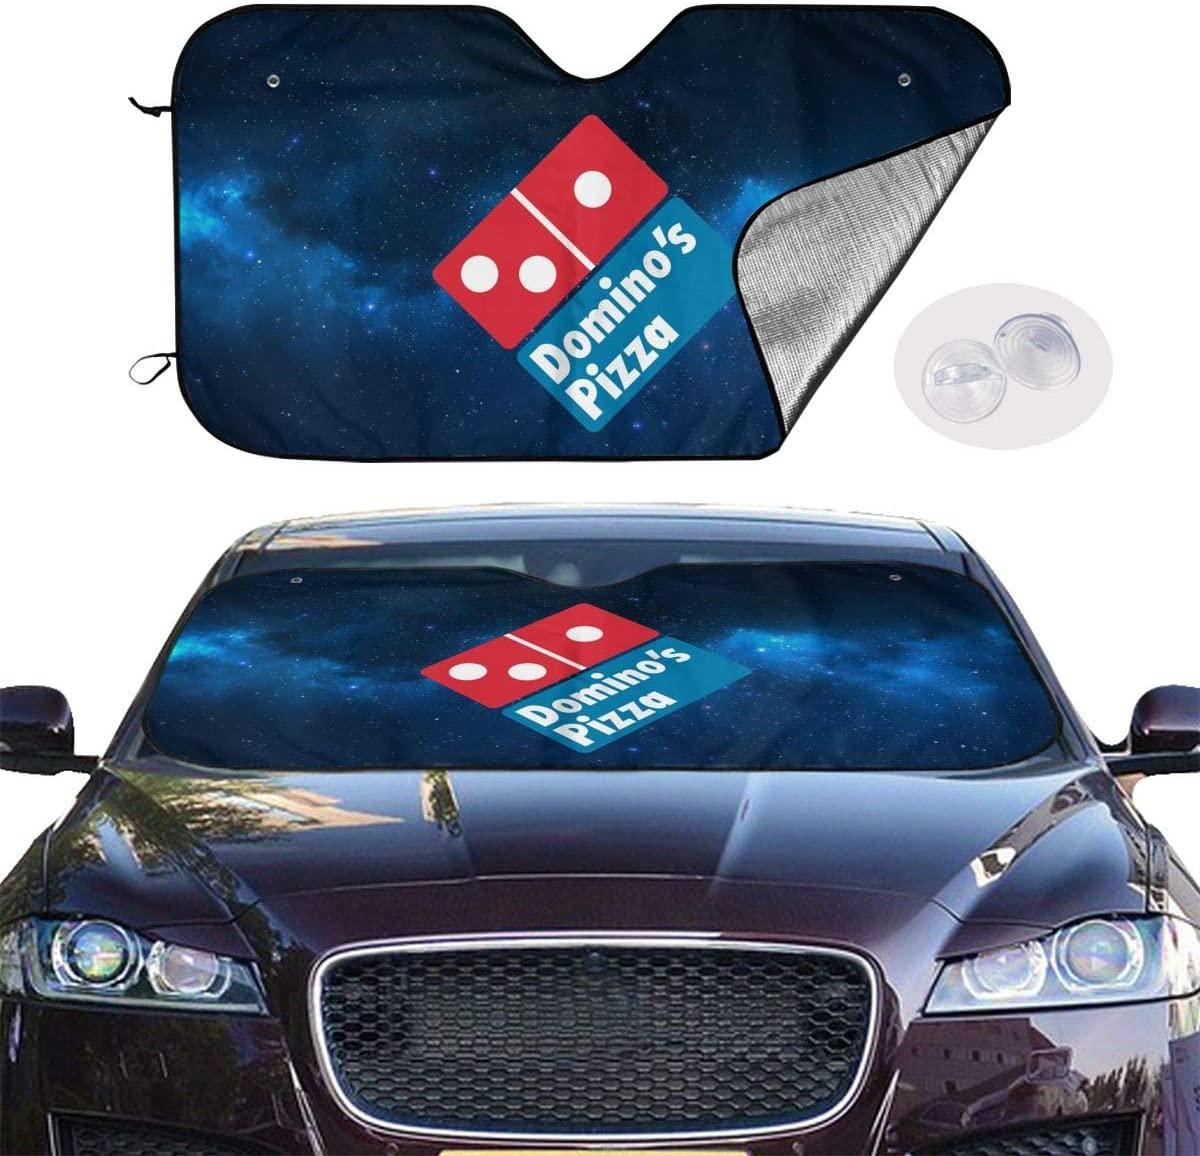 Abkola Dominos Universal and Stylish Car Windshield Visor